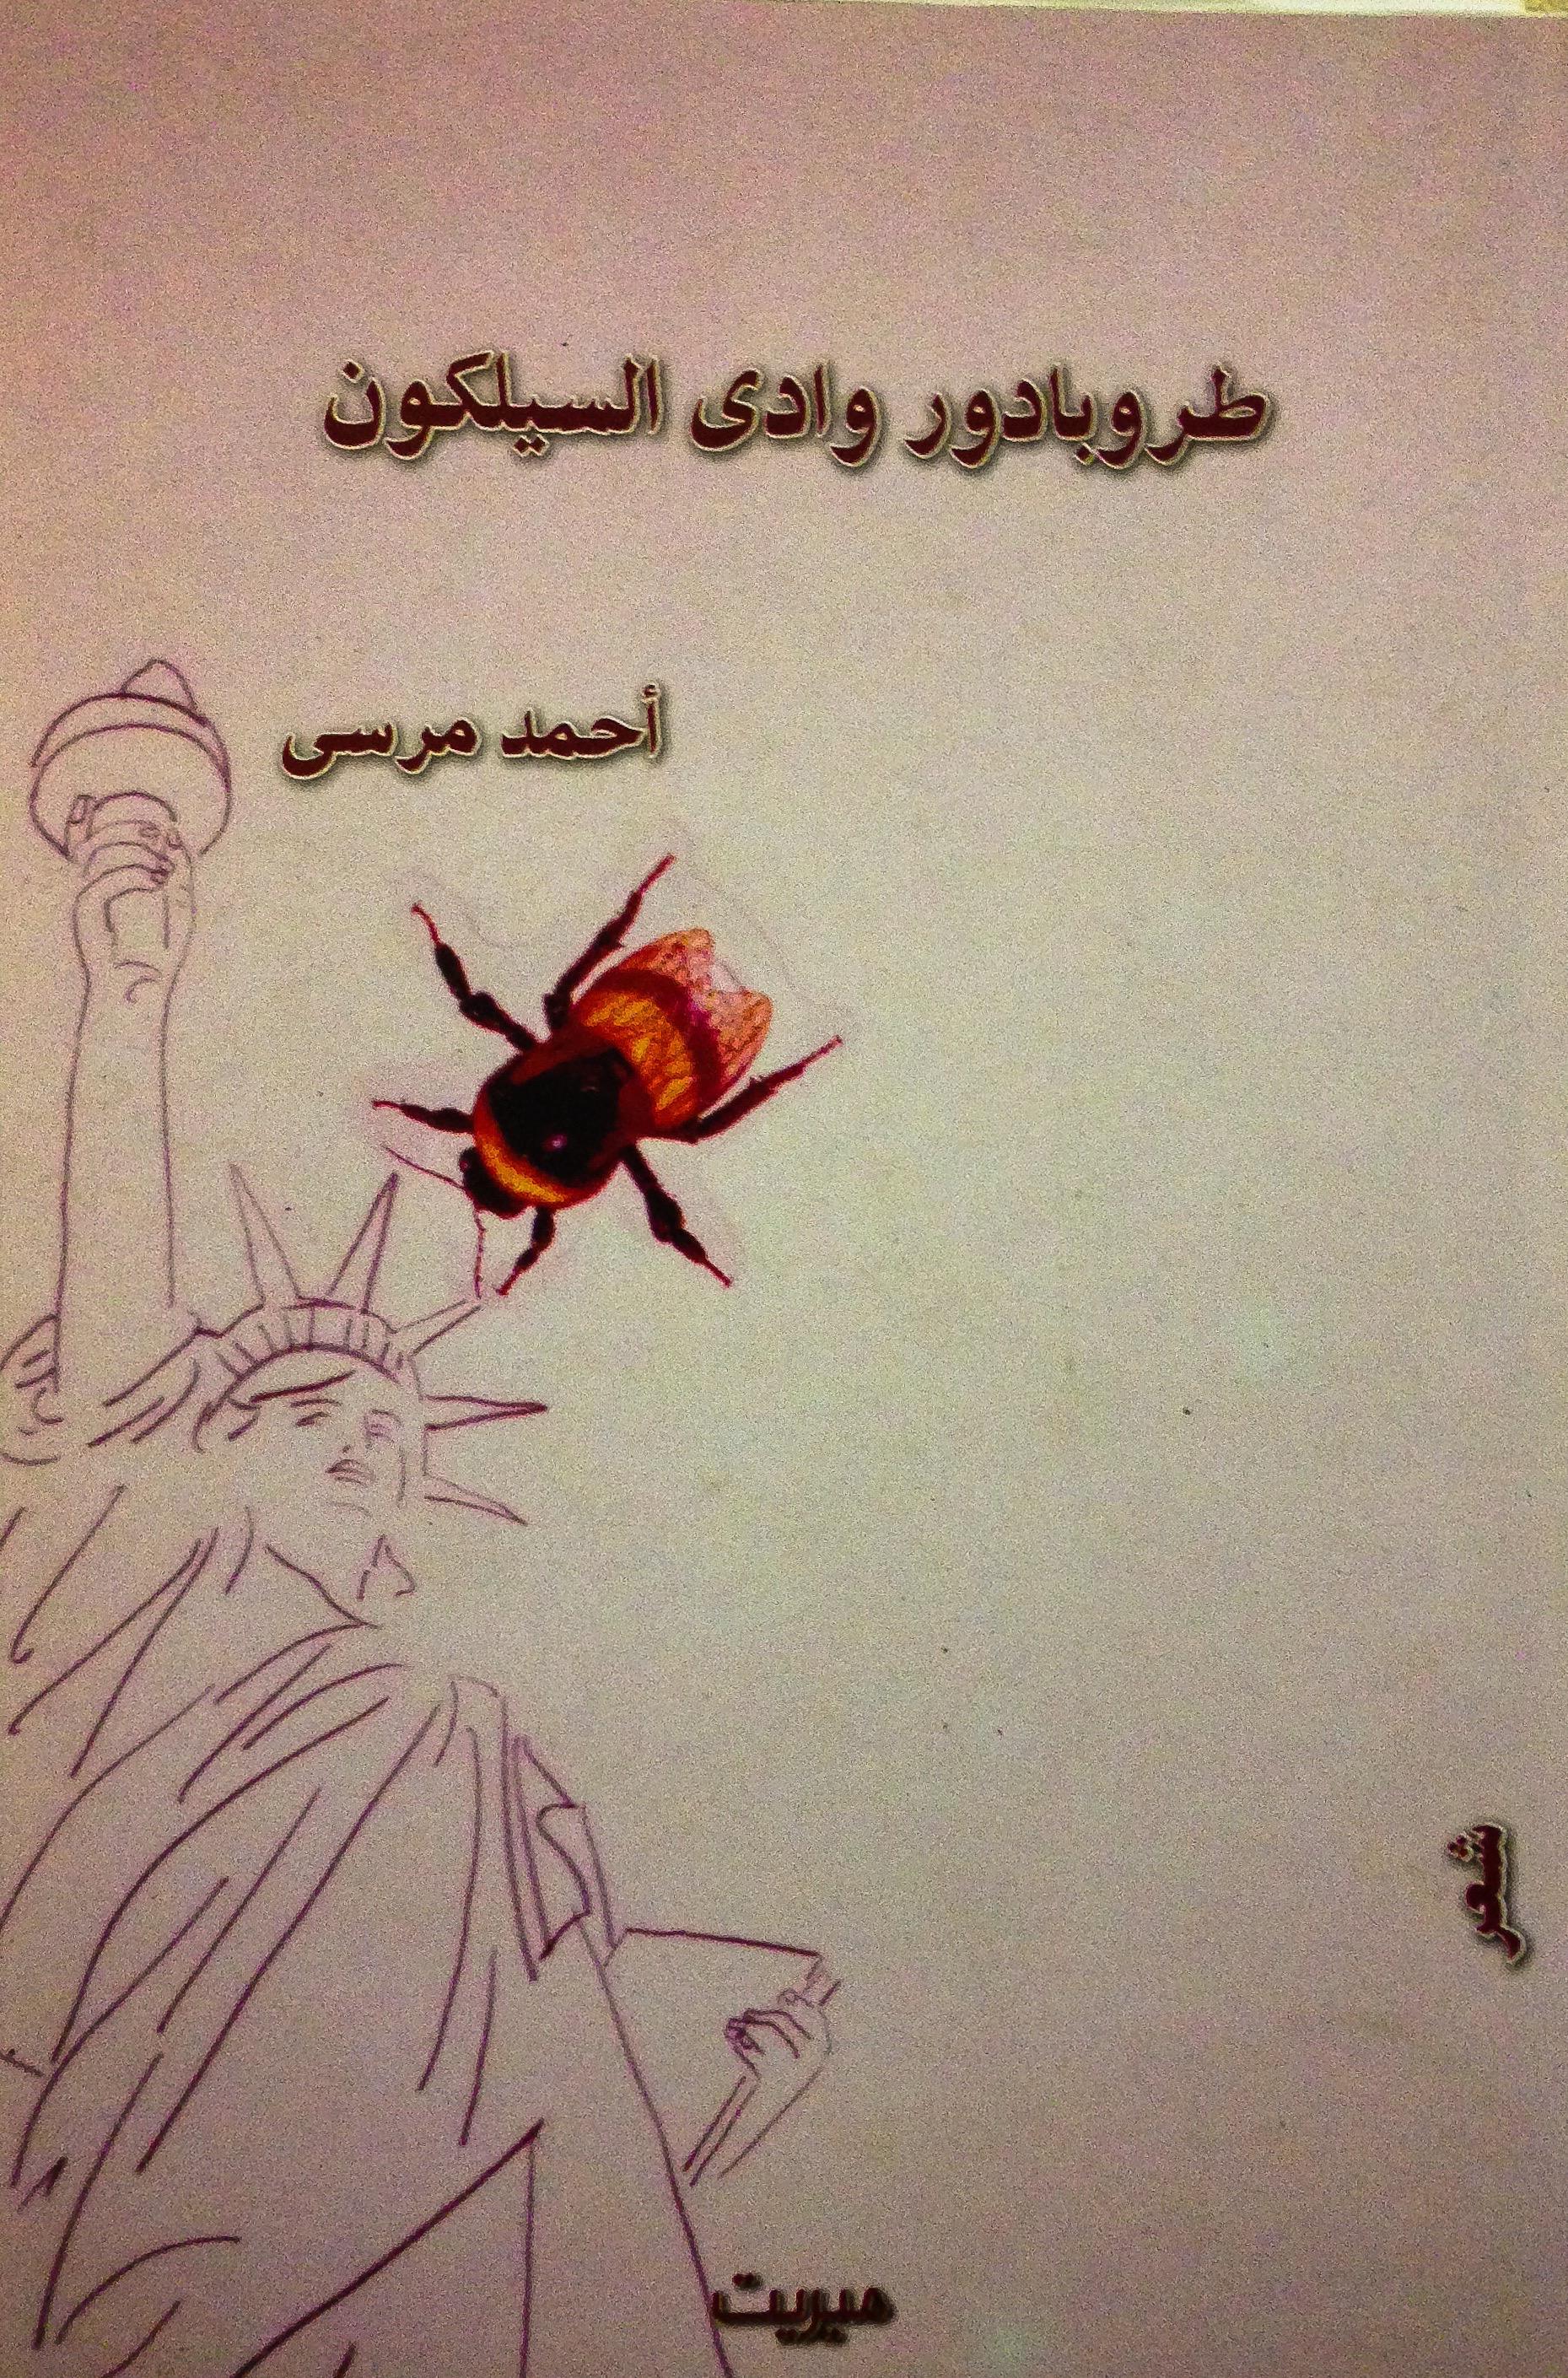 Cover by Ghada Amer